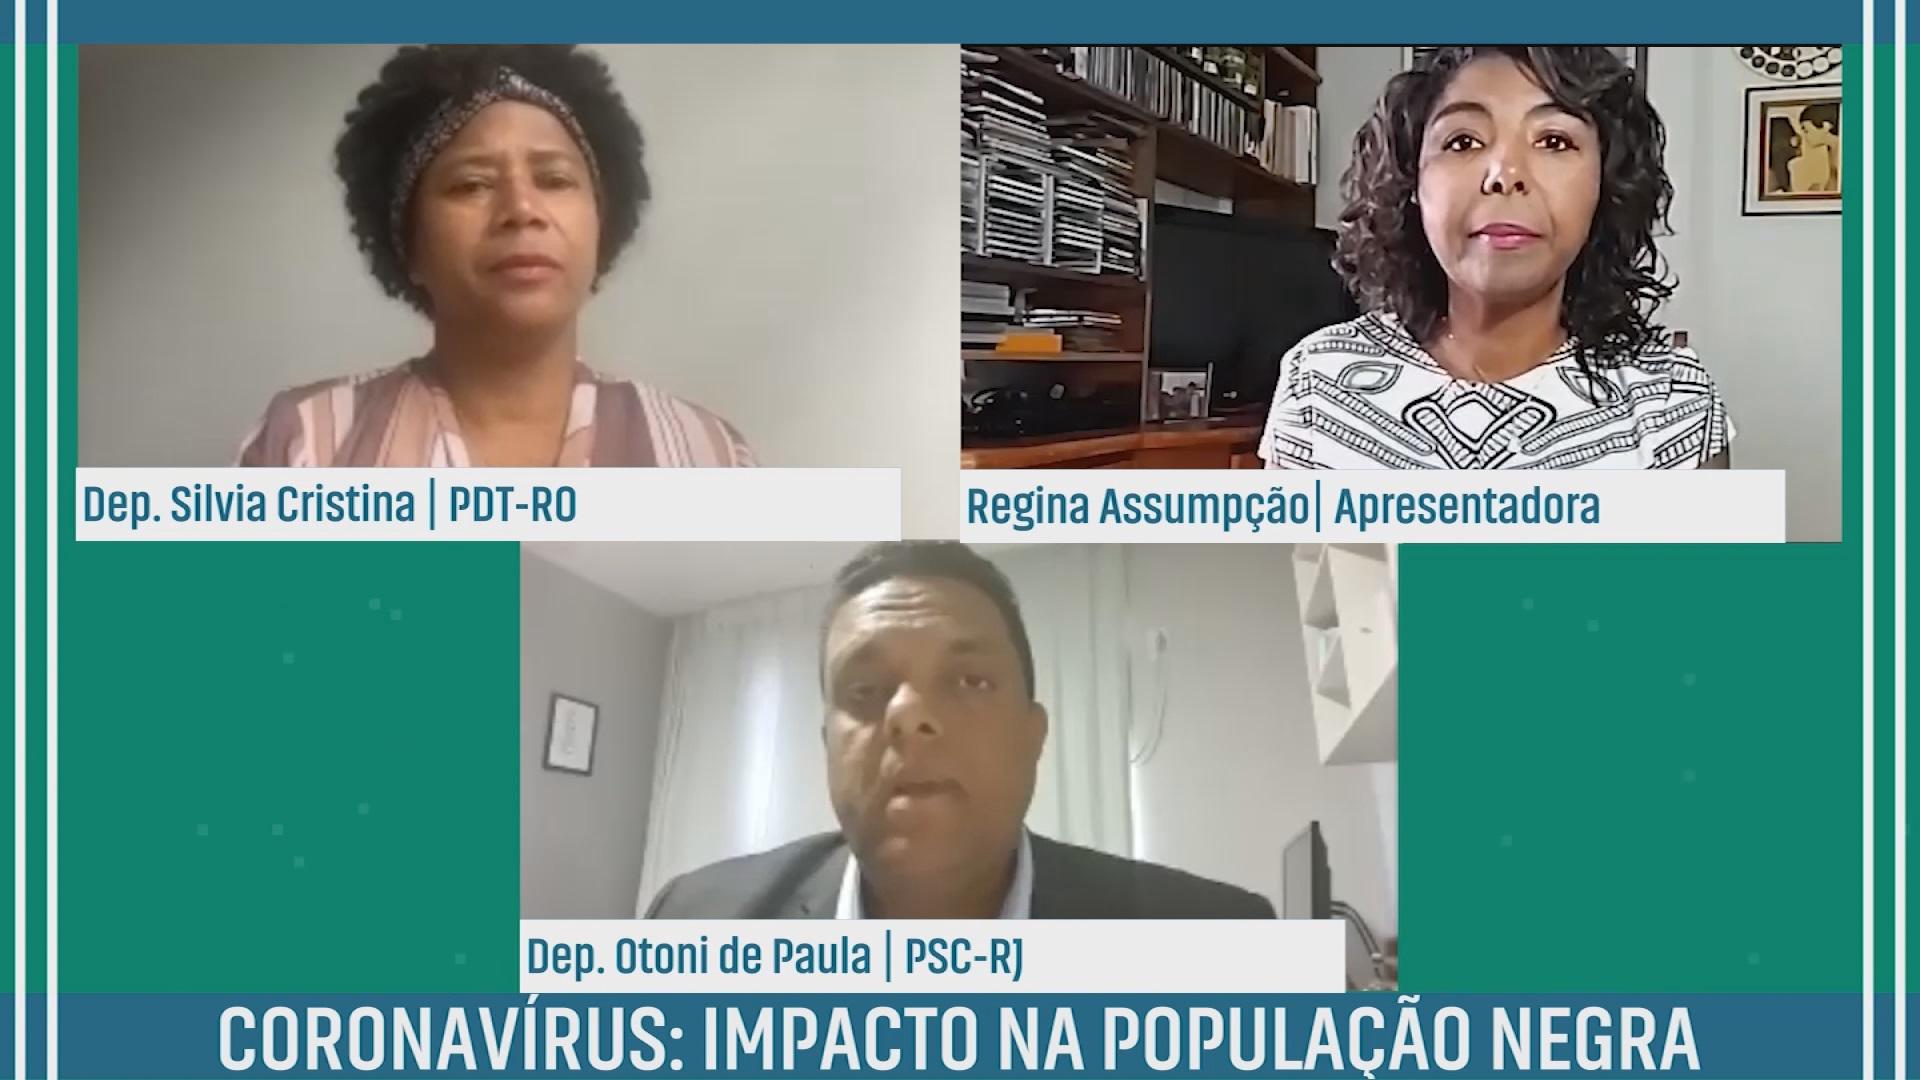 Coronavírus: impacto na população negra